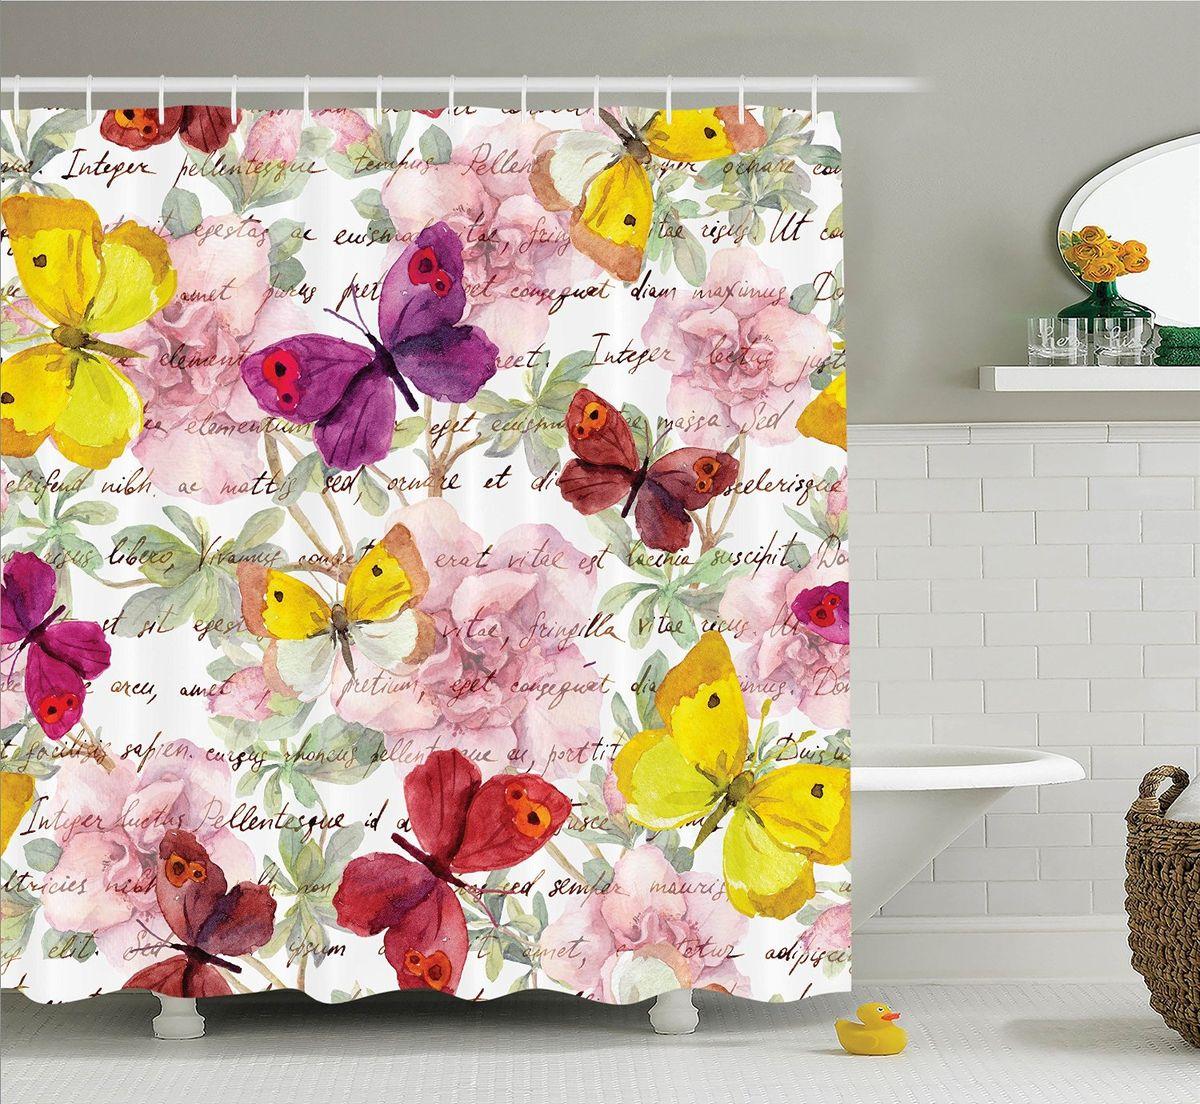 Штора для ванной комнаты Magic Lady Разноцветные бабочки, 180 х 200 см худи print bar edmonton oilers